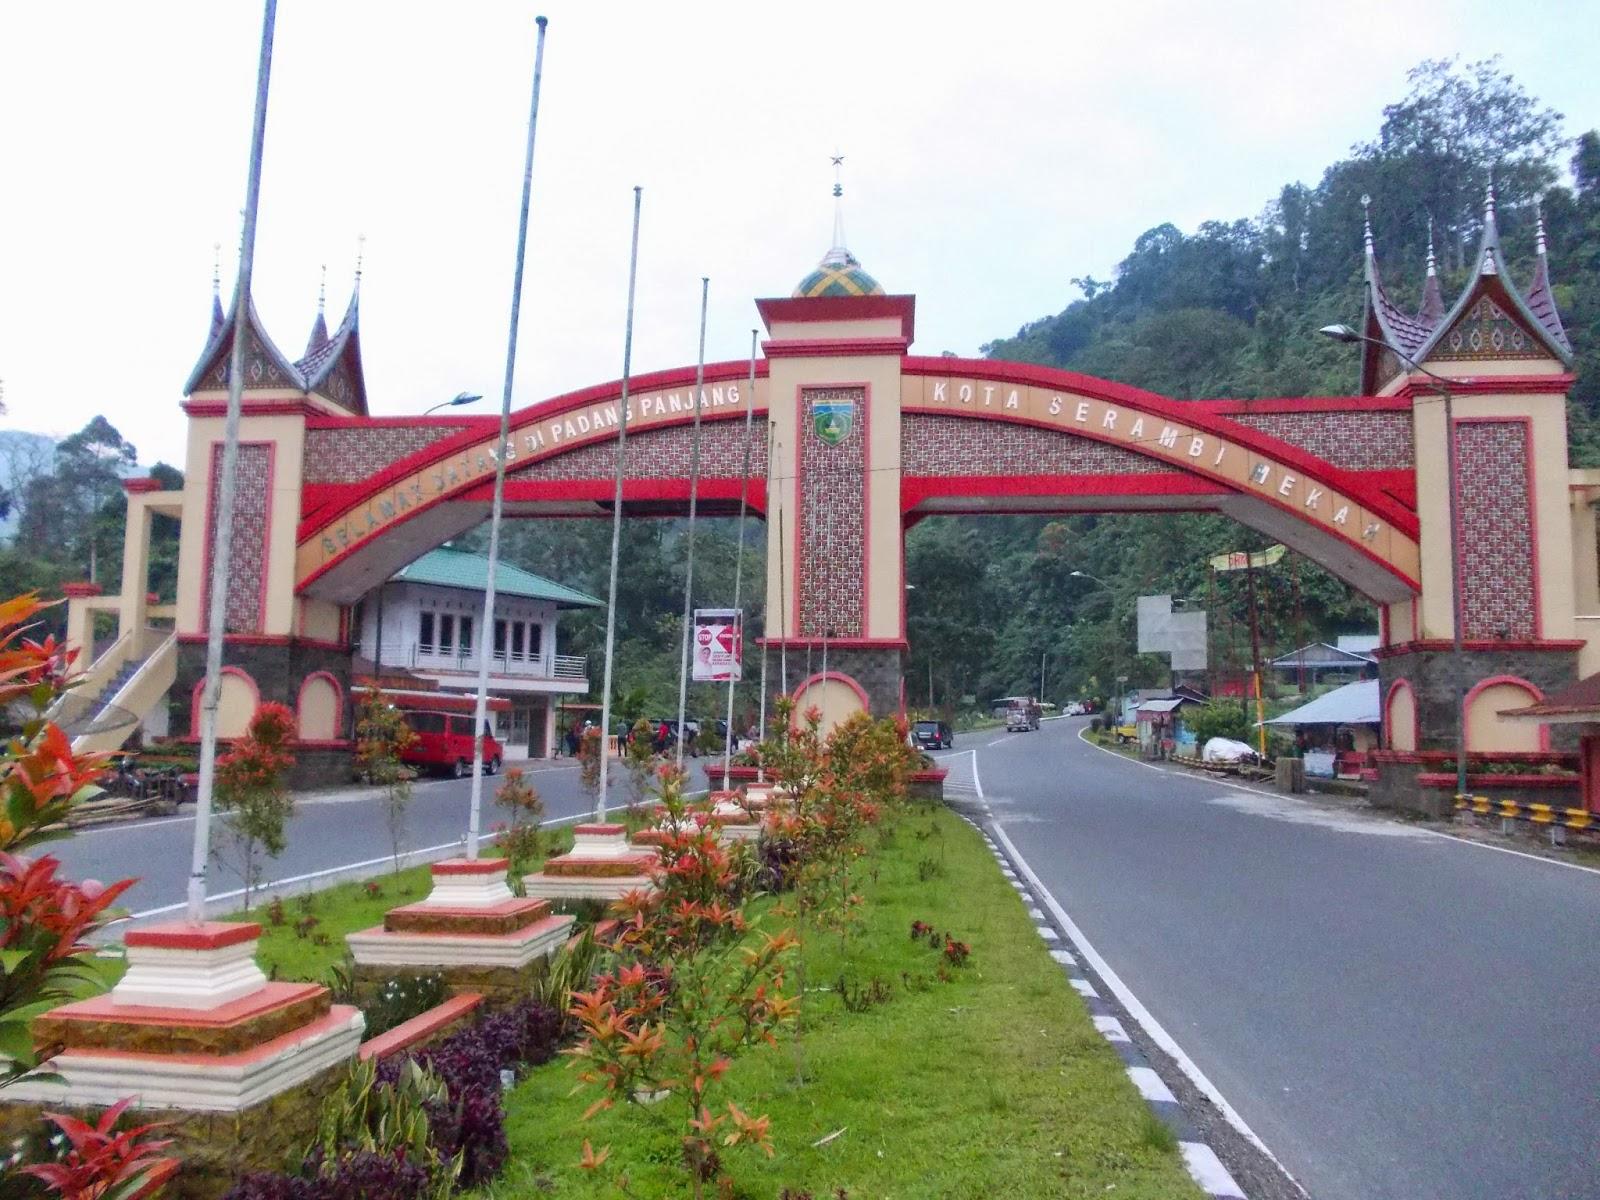 Wisata Alam dan Budaya Wilayah Sumatera Barat